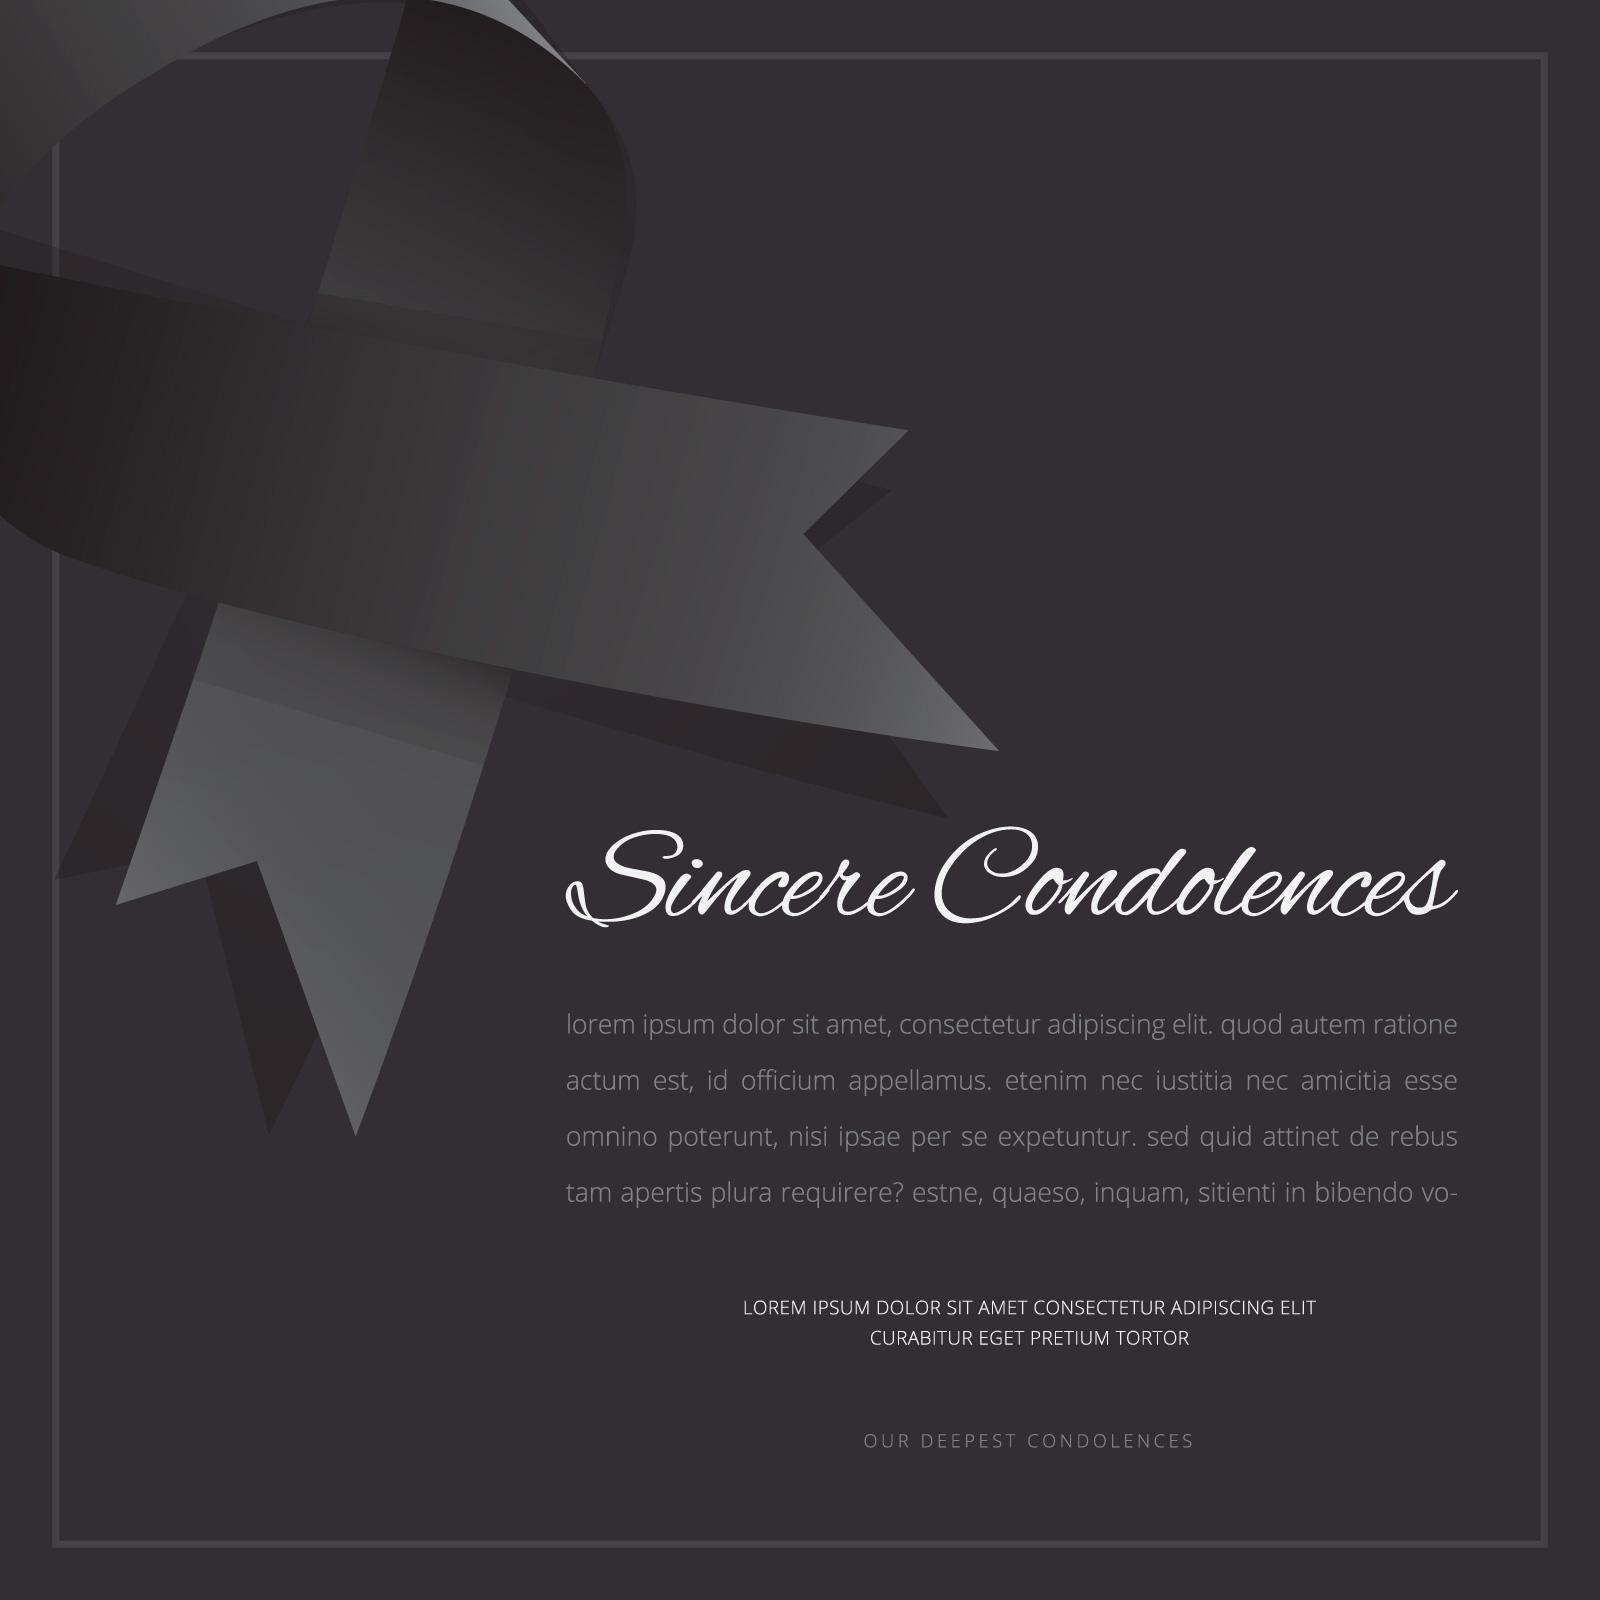 Condolence Free Vector Art 1082 Free Downloads